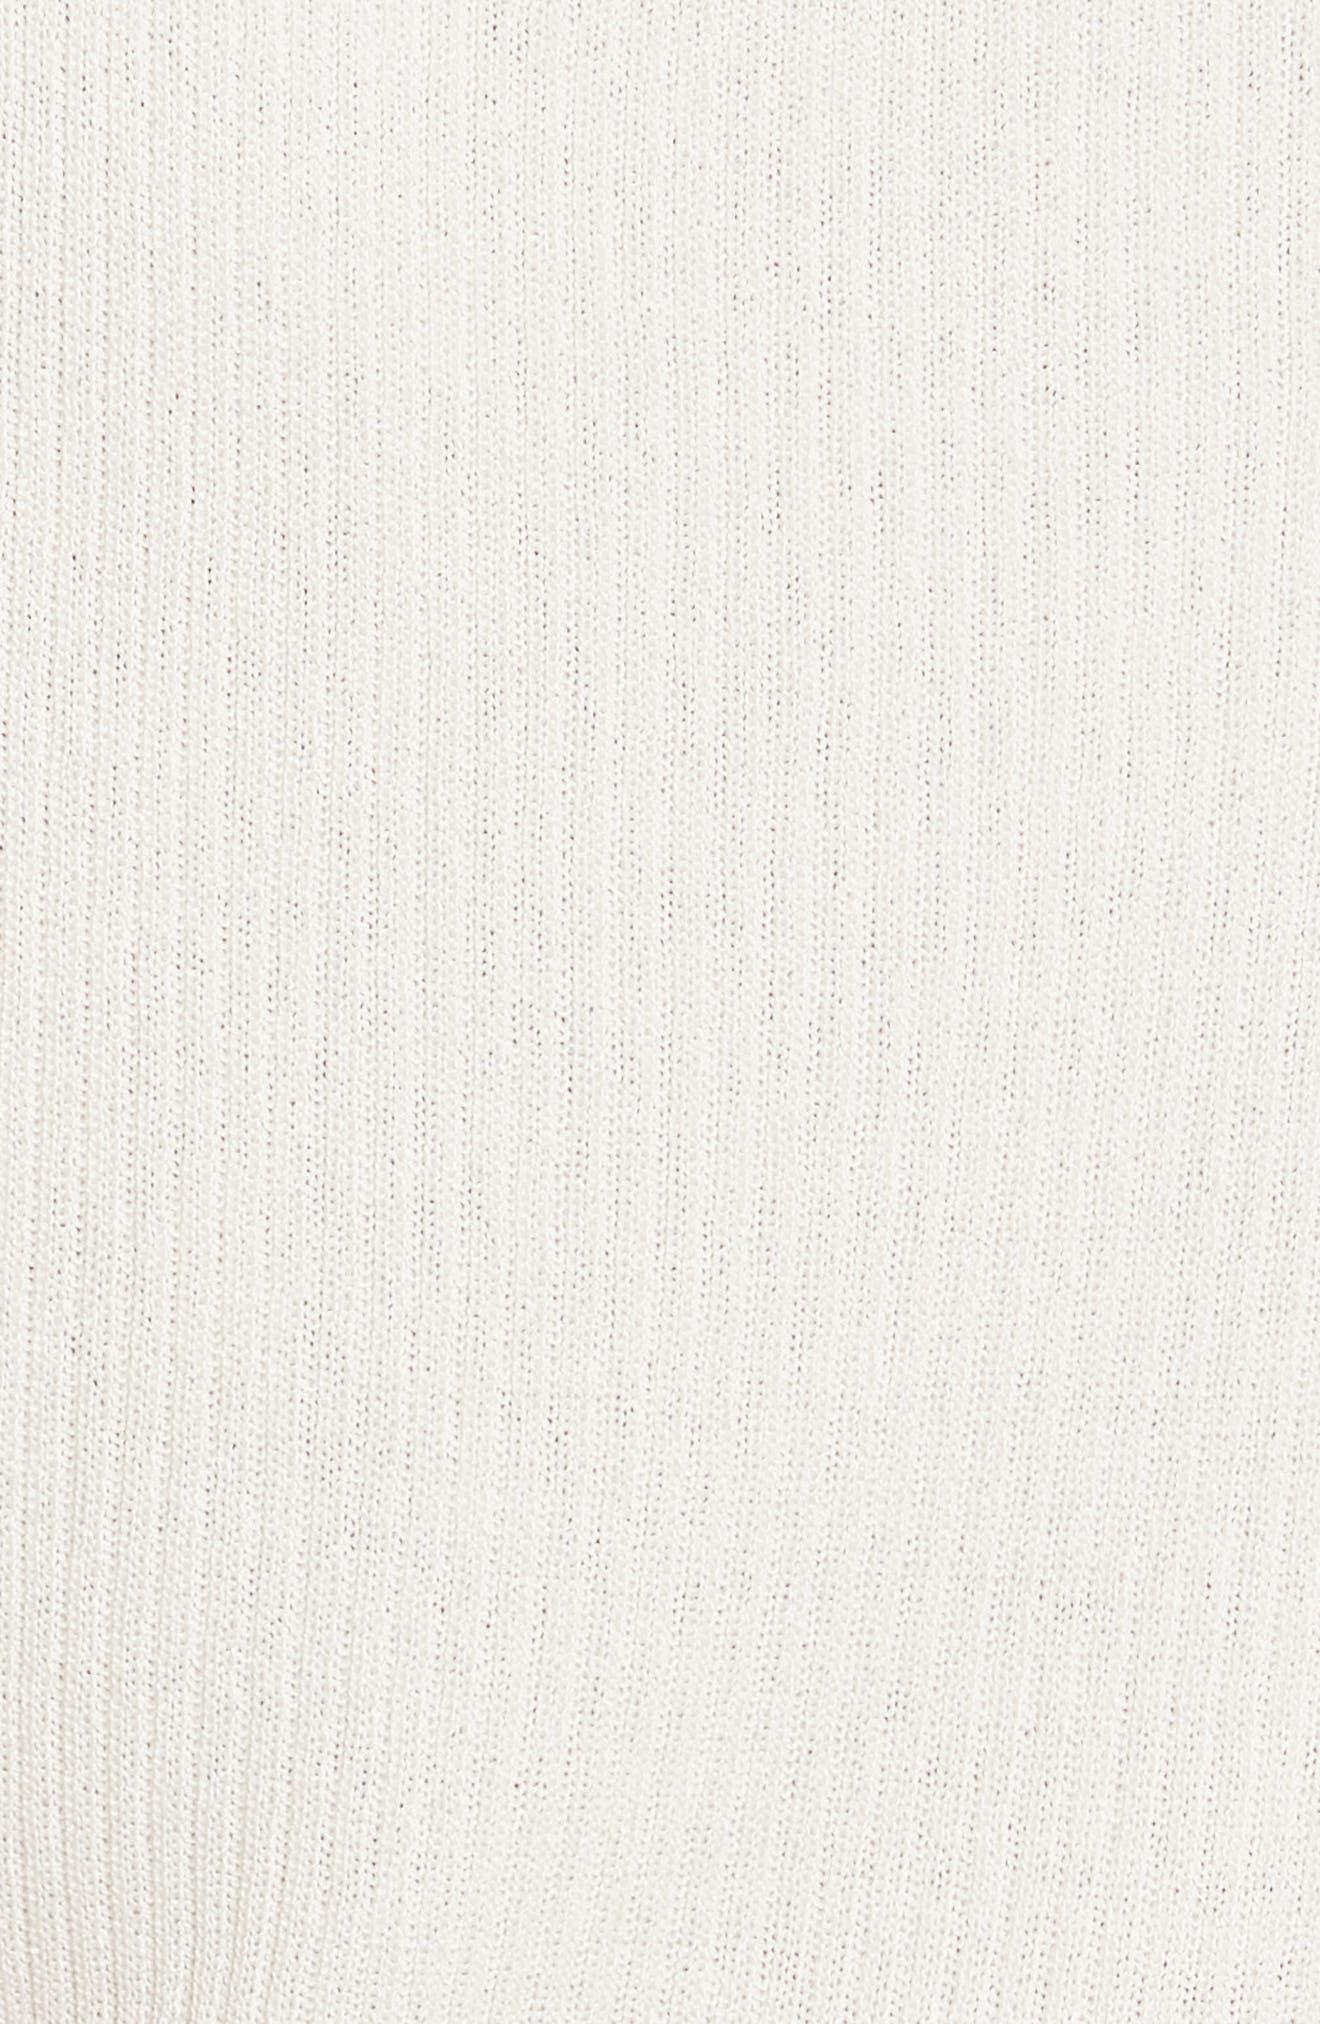 Diane Kruger x GREY Jason Wu Empire Knit Tank,                             Alternate thumbnail 5, color,                             900